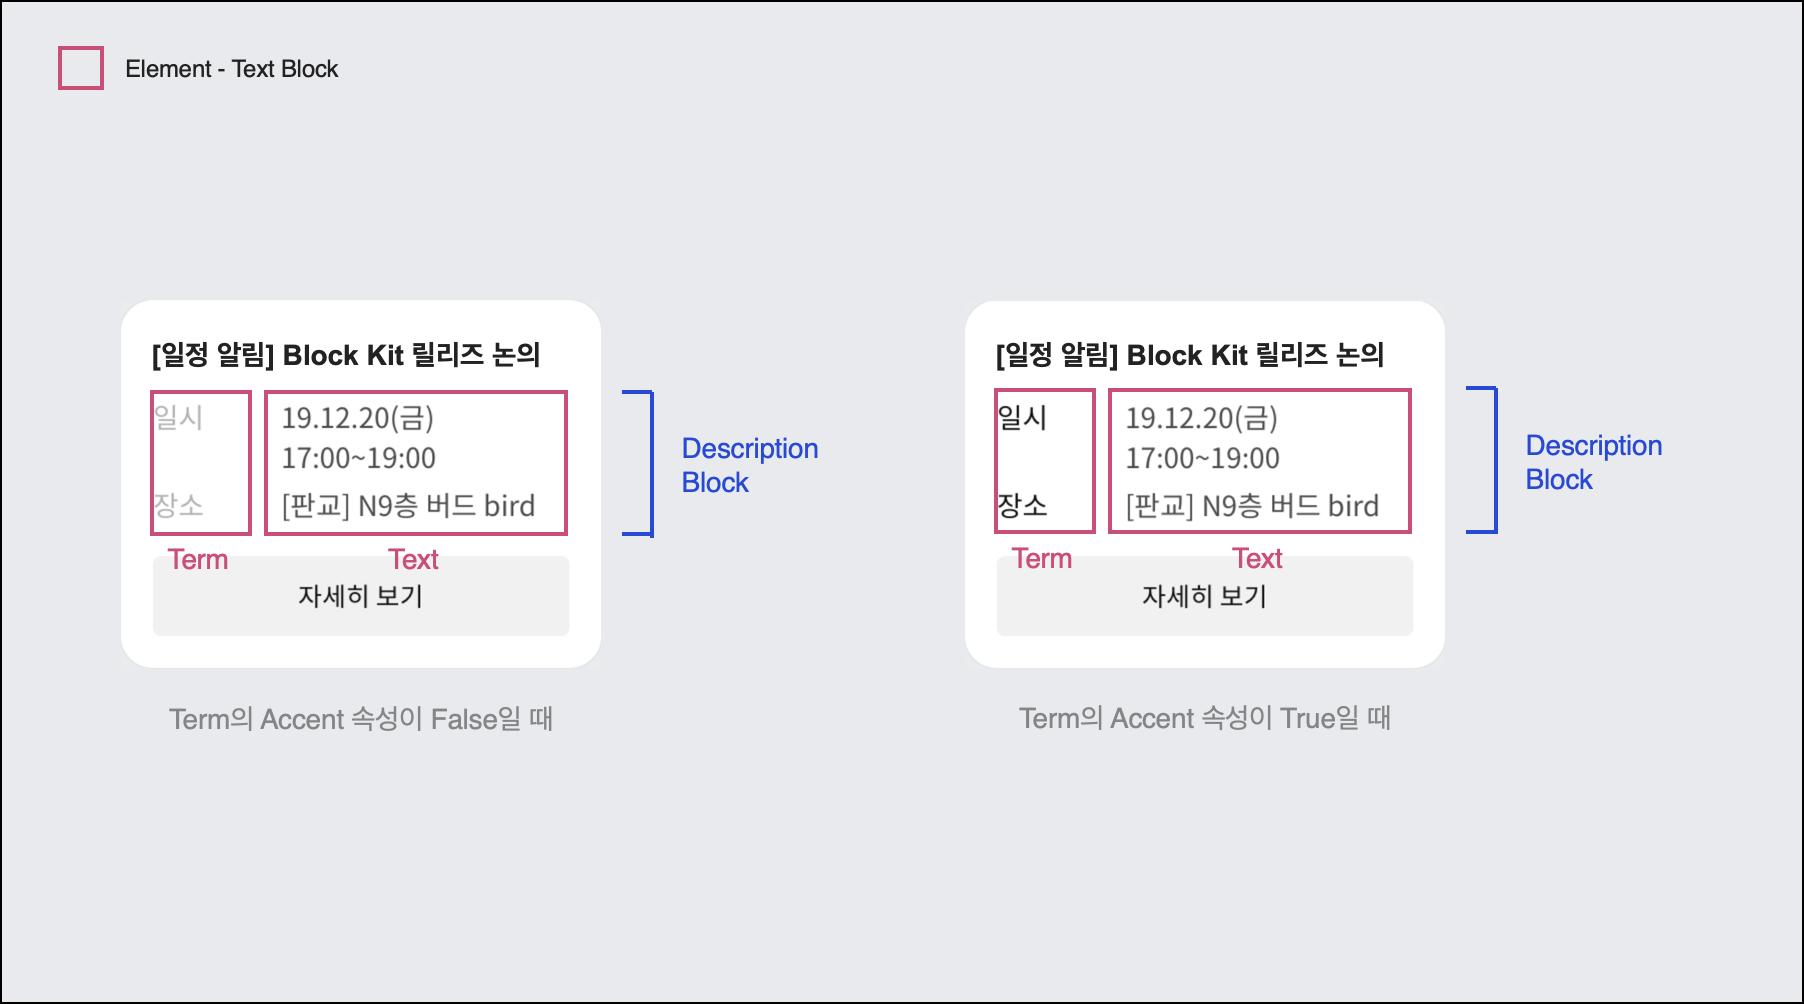 Description Block 구성과 블록 조합 예시